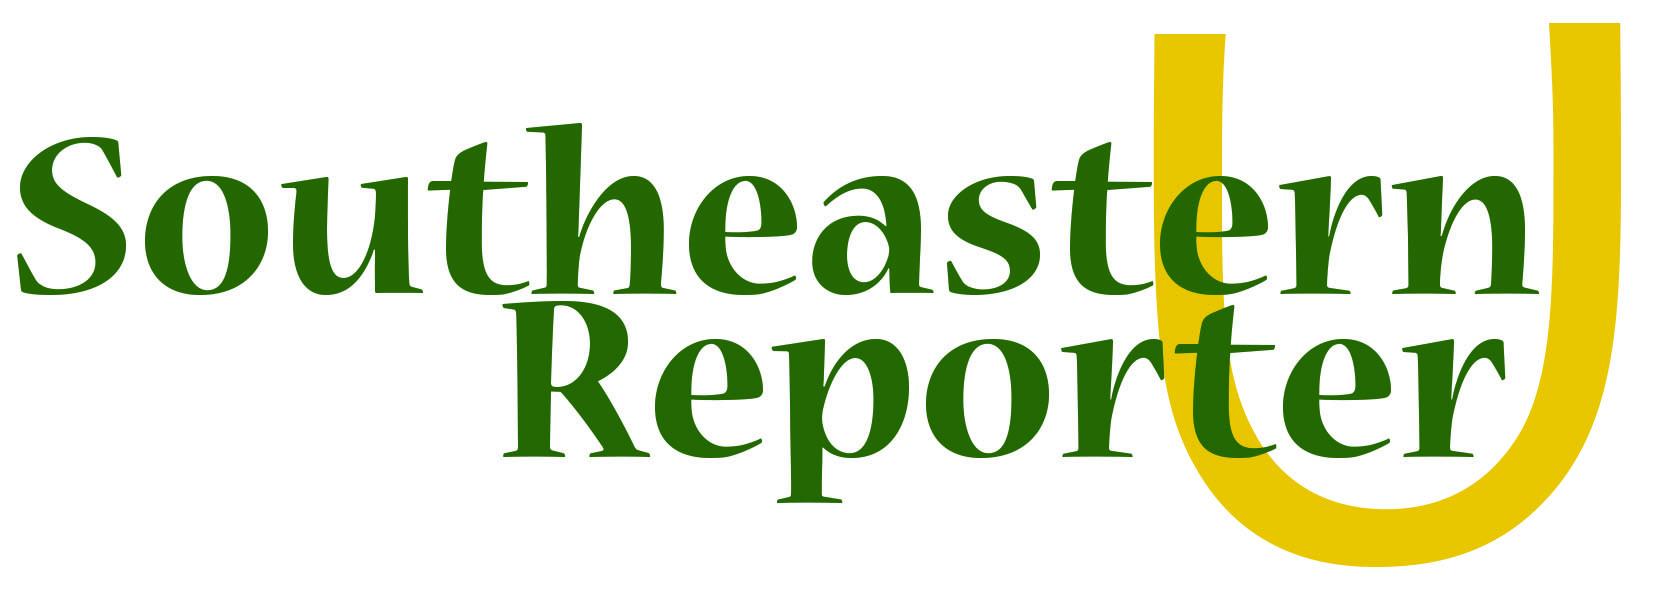 "Southeastern U Reporter\"" Pertaining To Southeastern Louisiana University Spring 2021 Semester Dates"